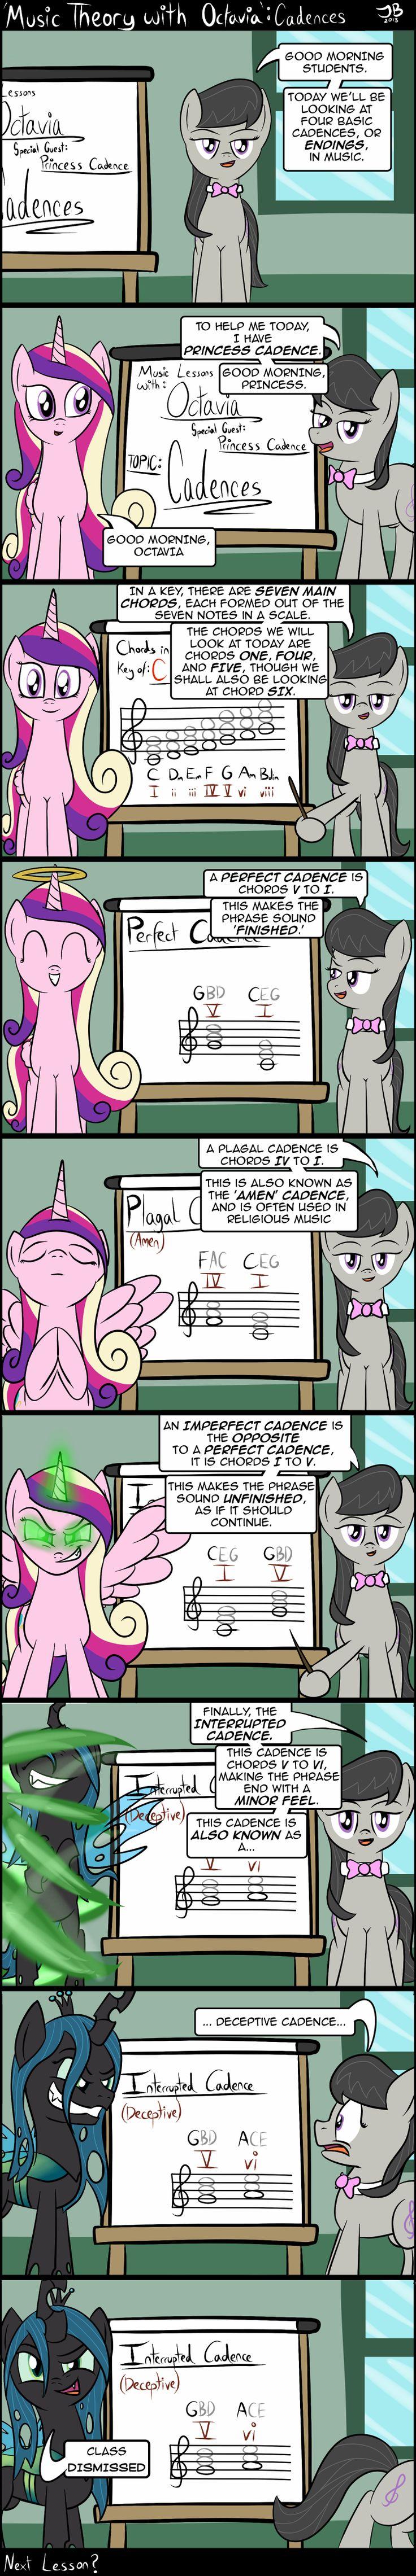 Music Theory with Octavia: Cadences by ReakkorShrike.deviantart.com on @deviantART